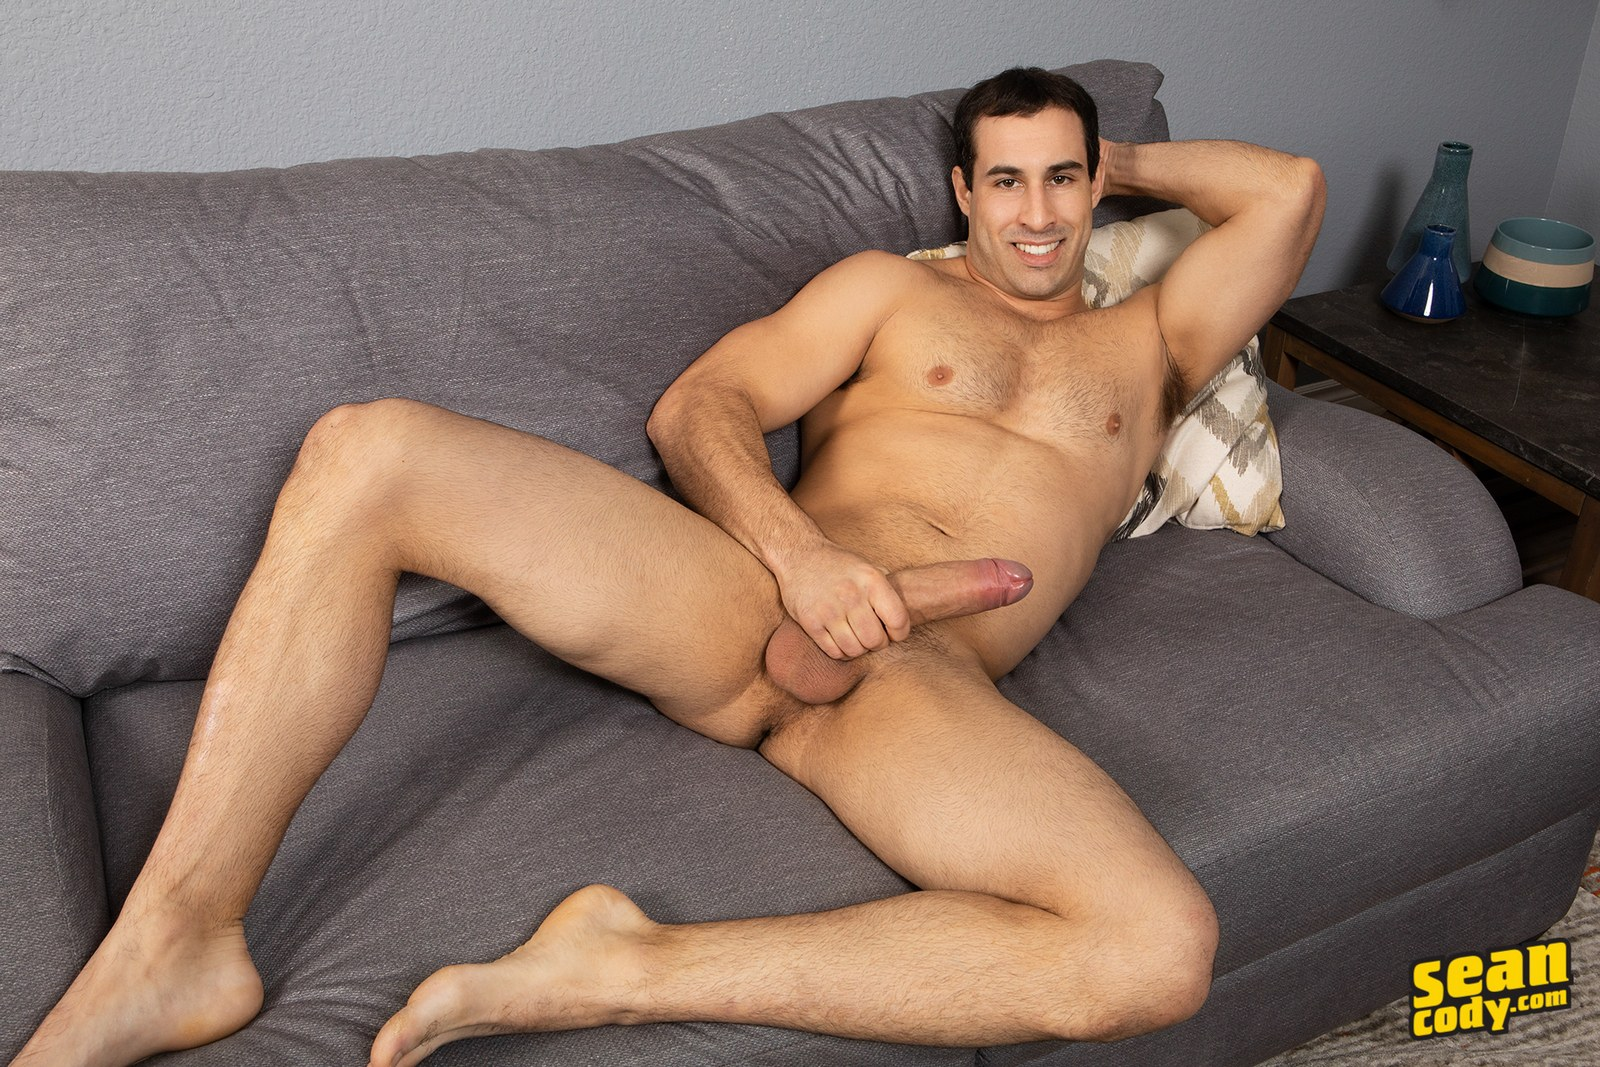 Bareback gay porn from Sean Cody